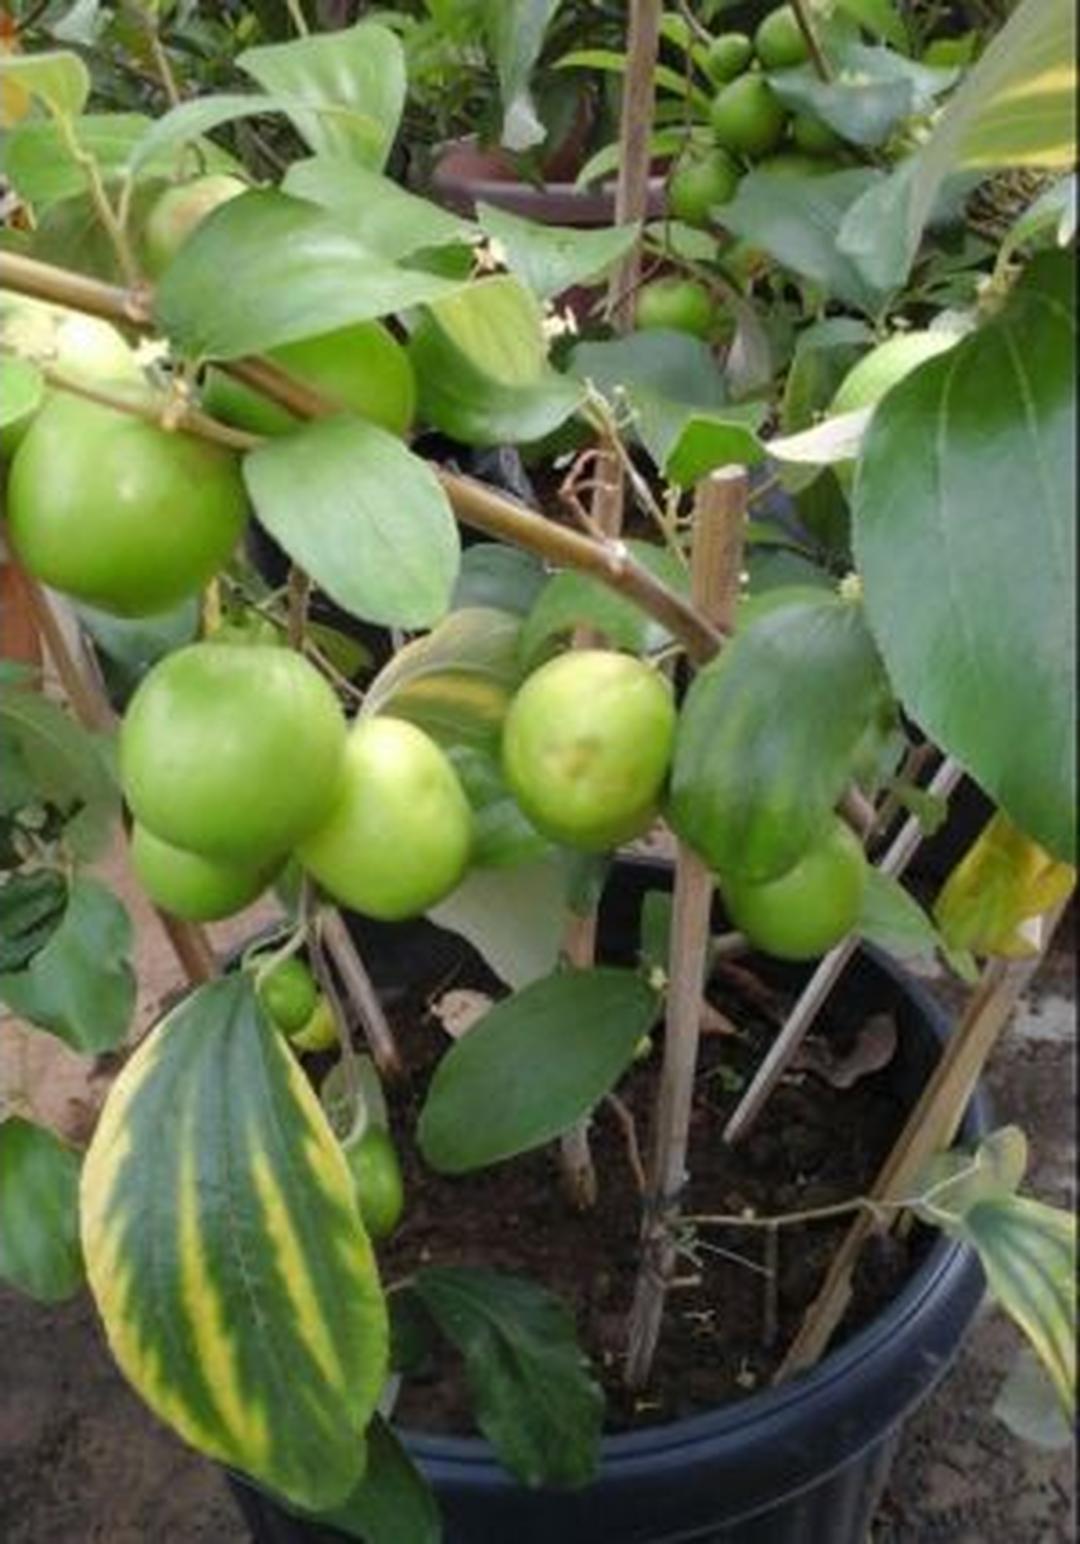 Murah Meriah! bibit Tanaman buah Apel India PUTSA super murah Kota Bogor #bibit buah genjah termurah